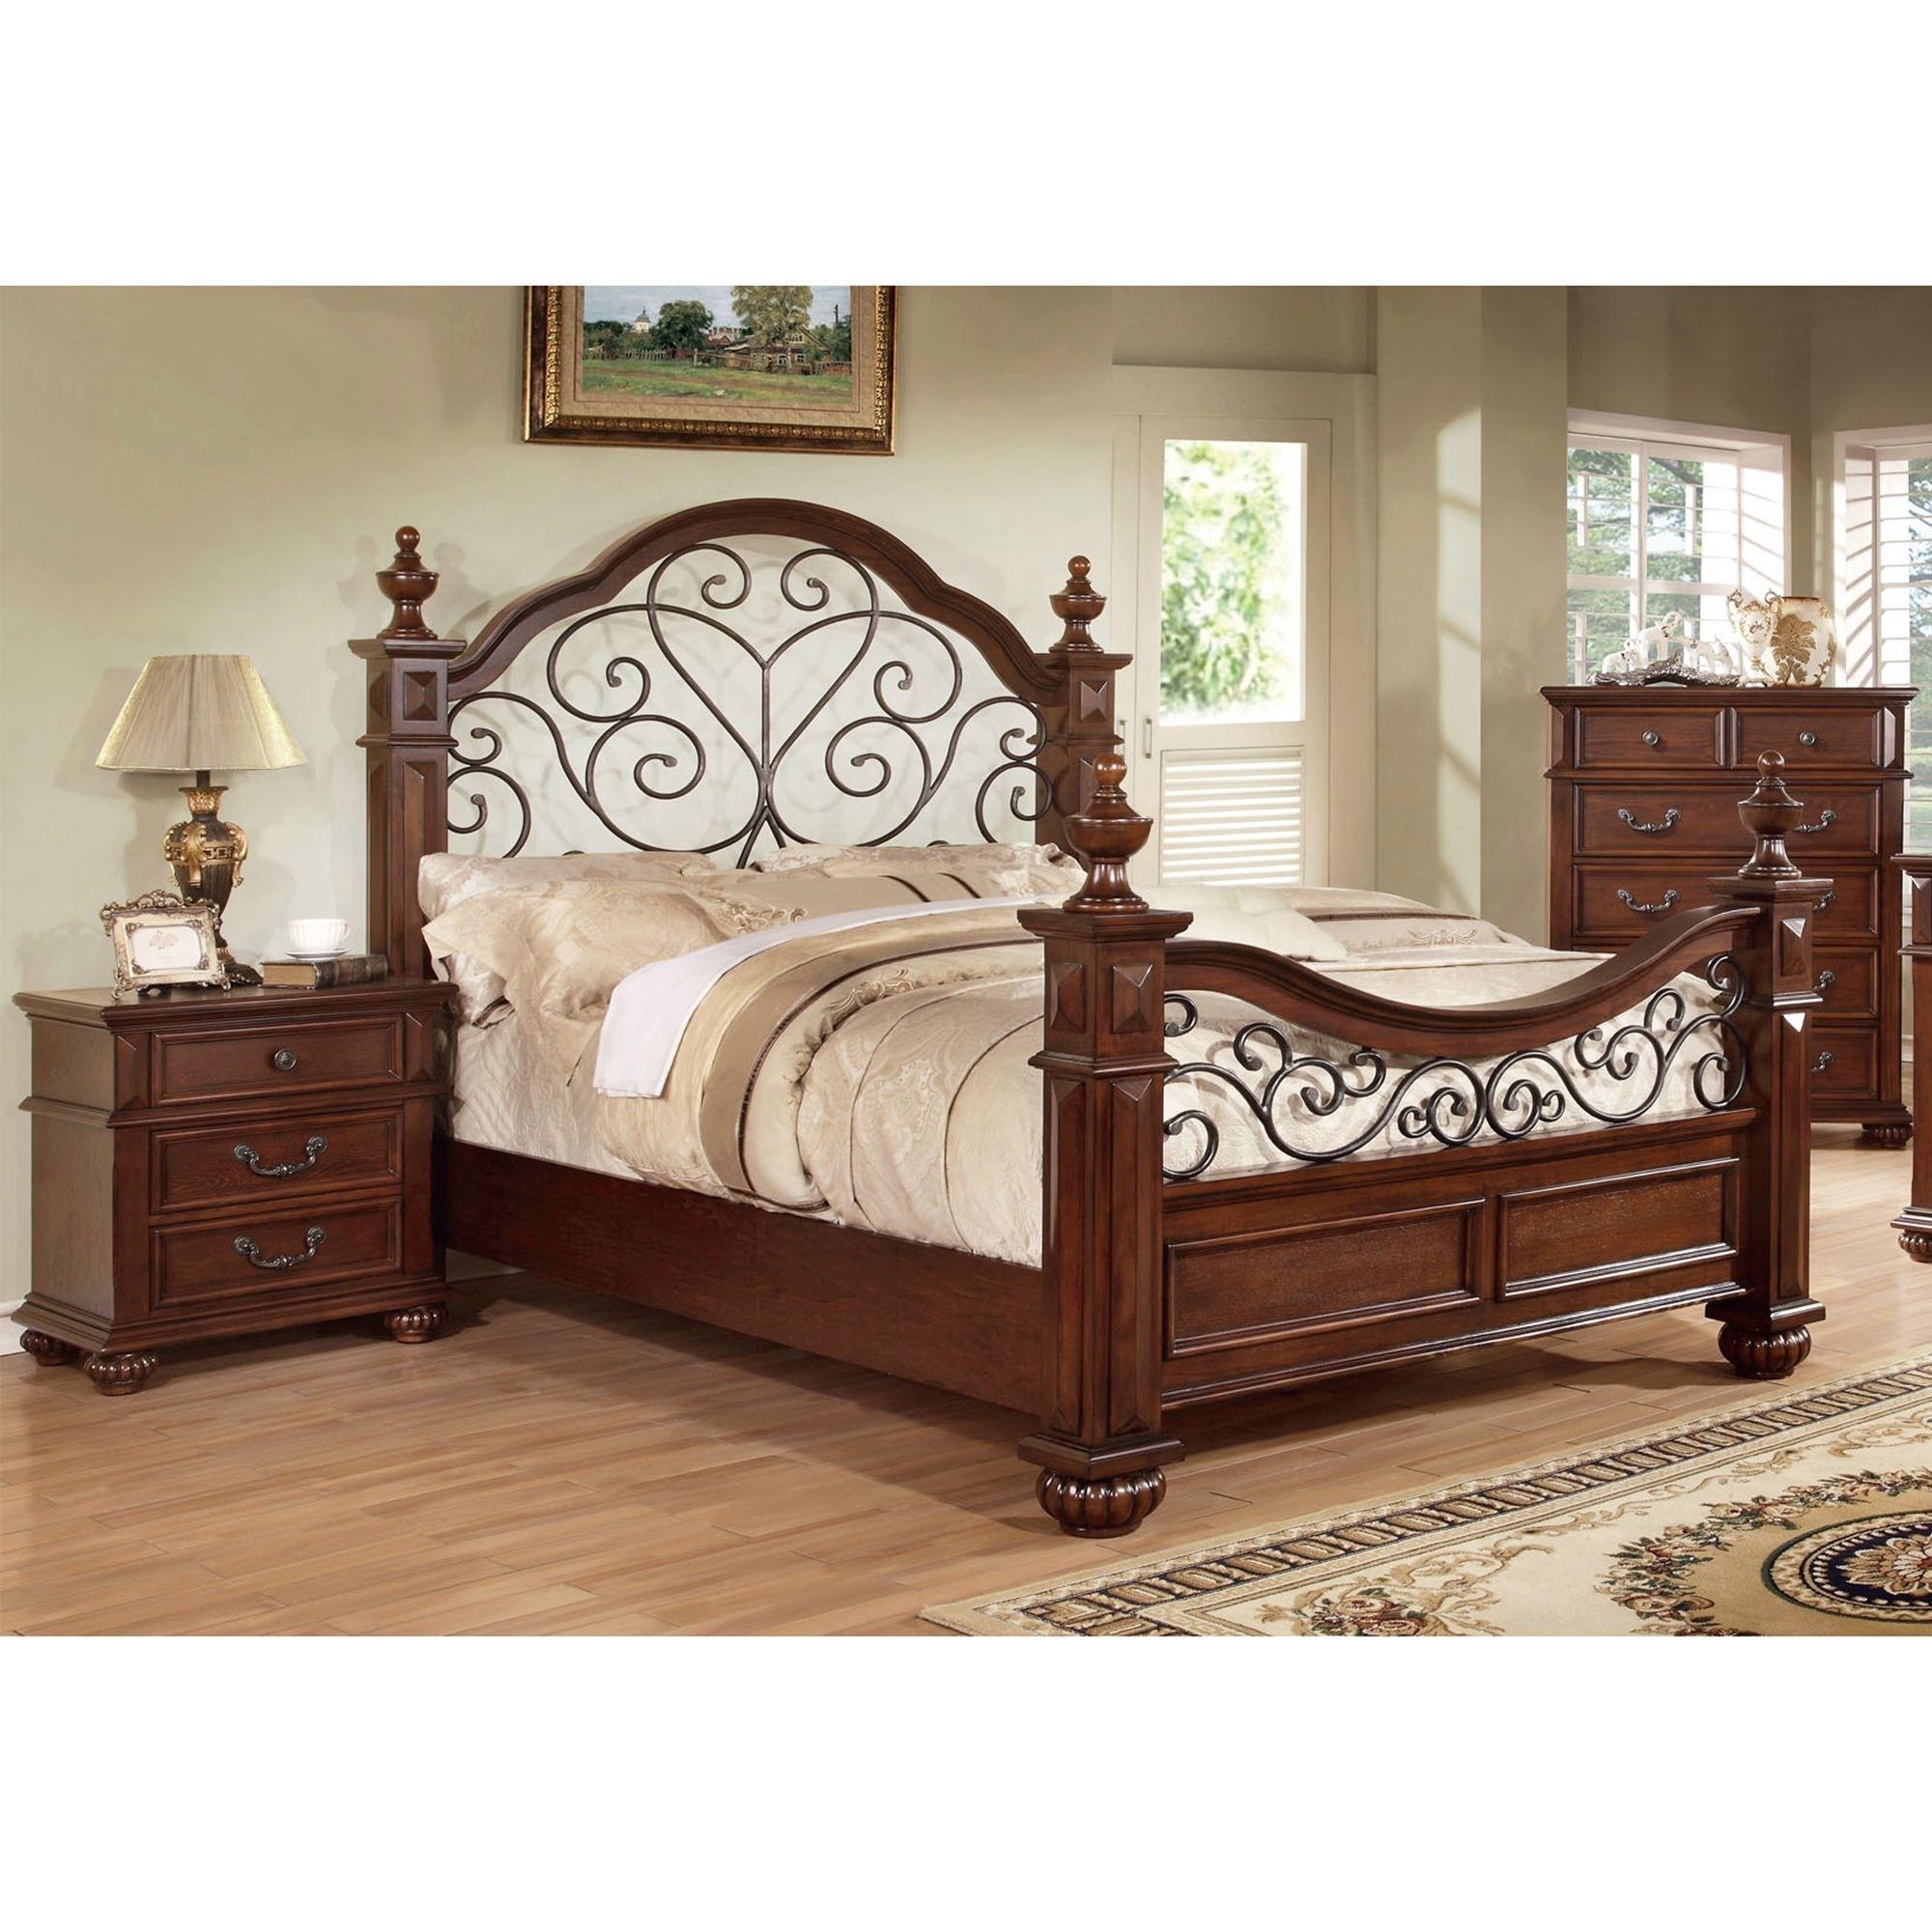 Landaluce Transitional Style Antique Dark Oak Finish Eastern King Size Bed  Frame Set